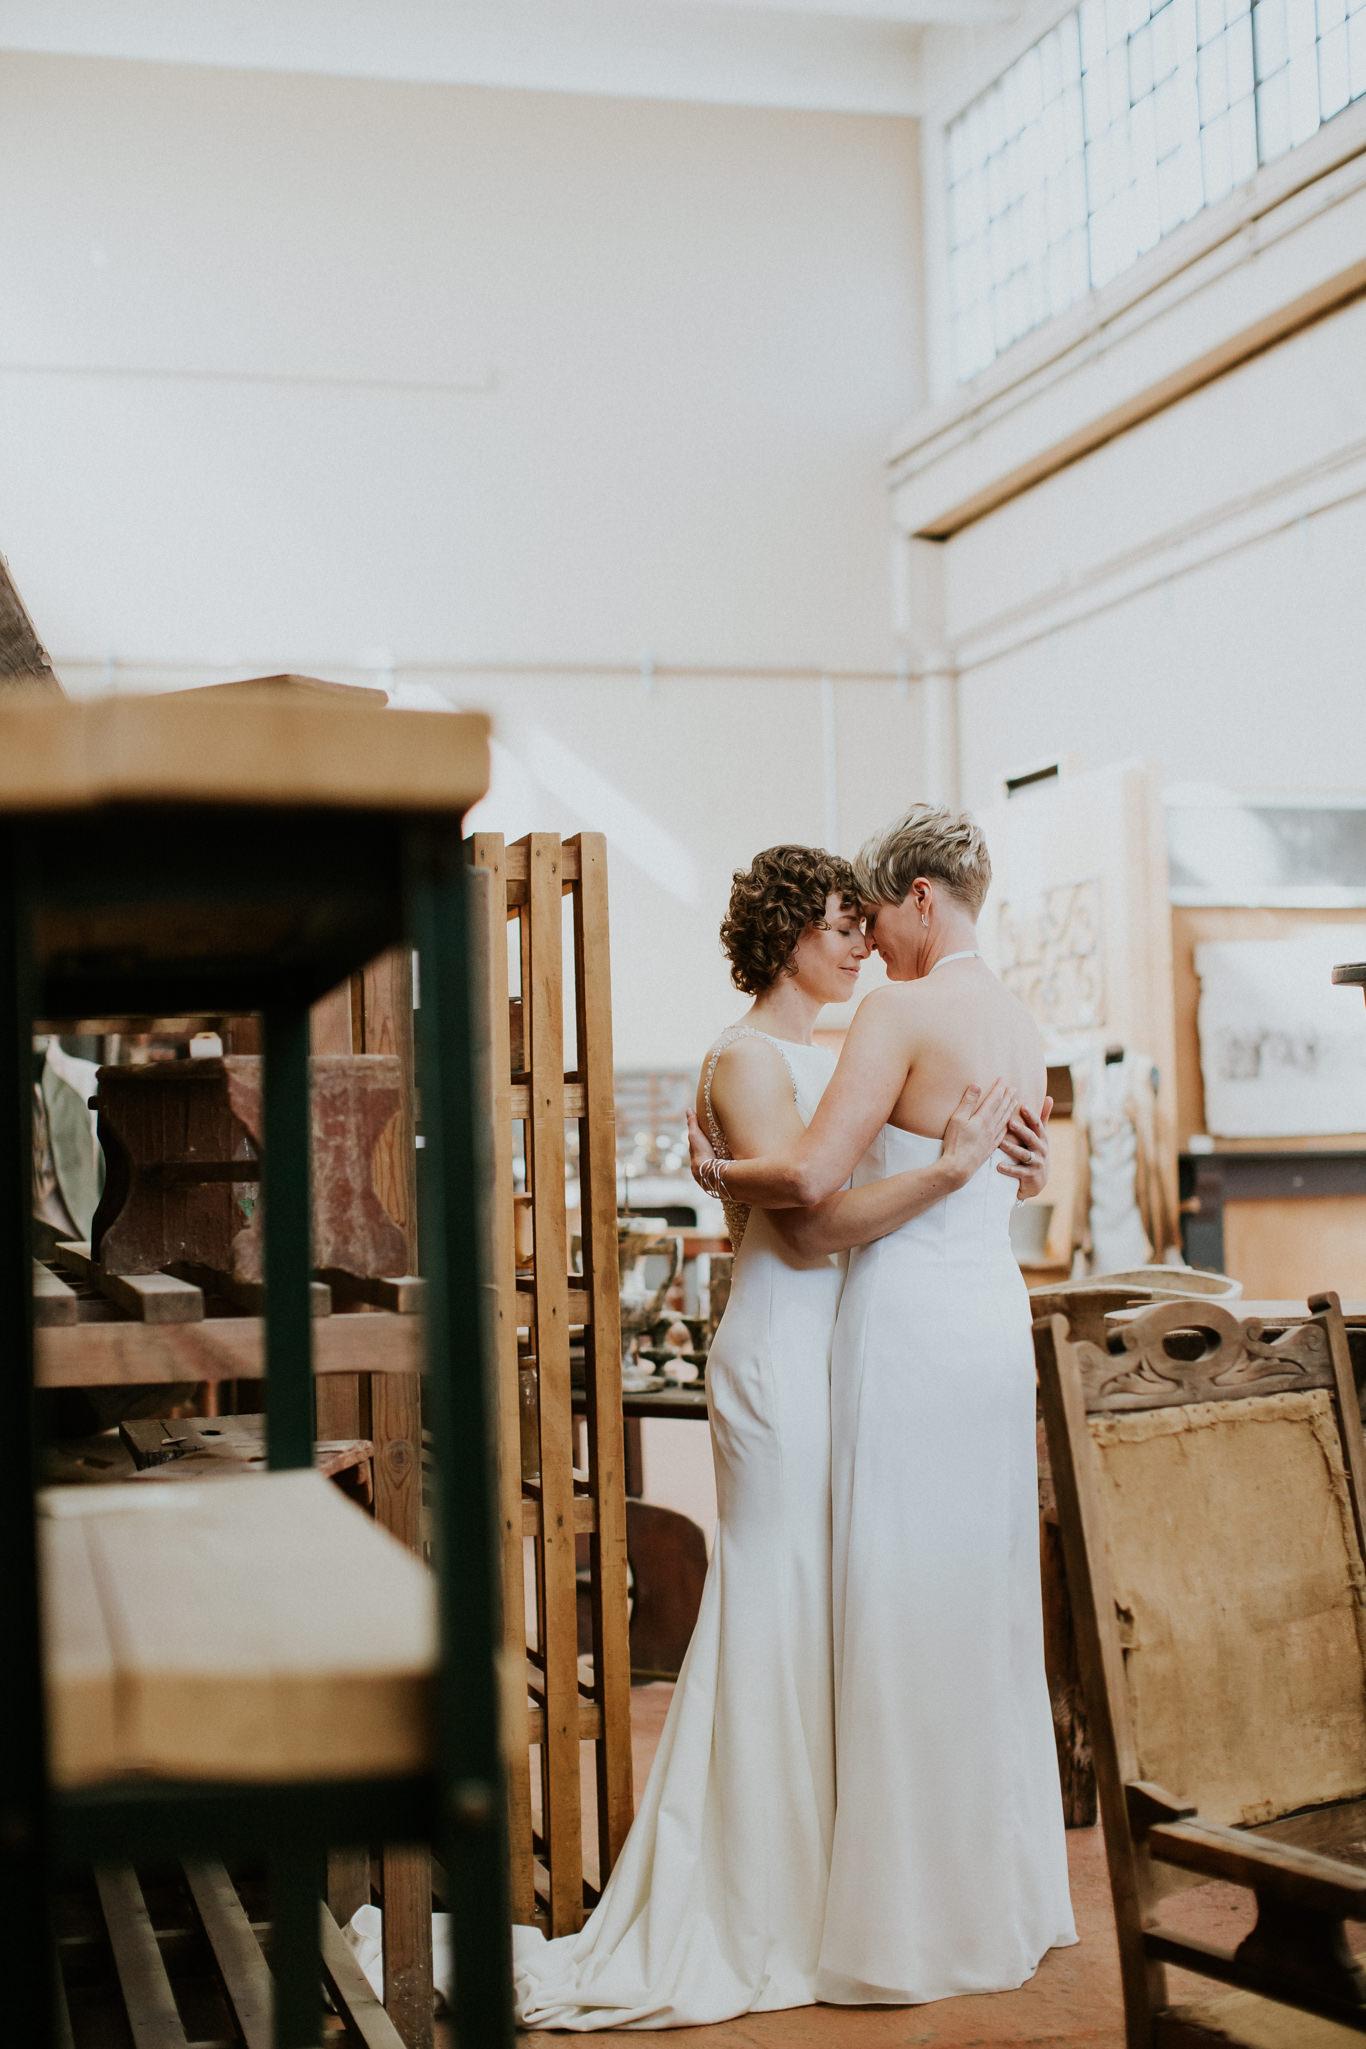 Lindsay-and-Heather-Charbar-Restaurant-Wedding-in-Calgary-33